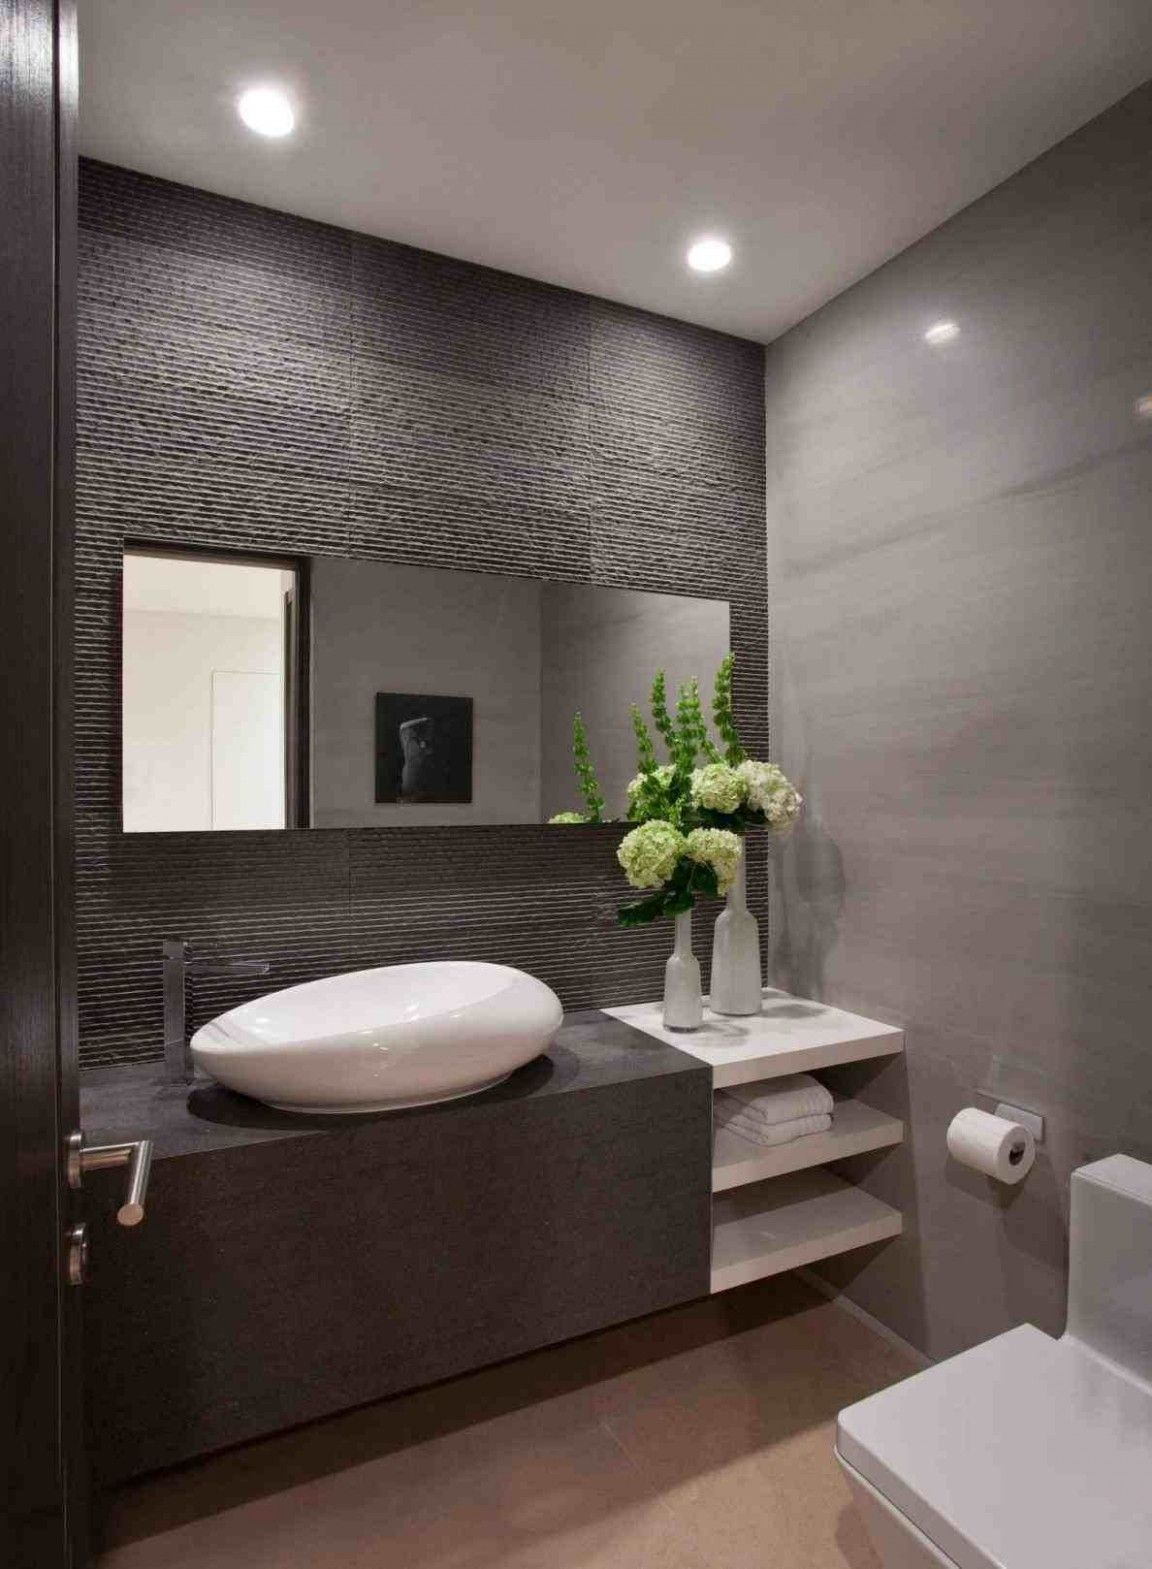 Modern Half Bathroom Ideas Modern Bathroom Decor Bathroom Design Small Contemporary Bathroom Designs